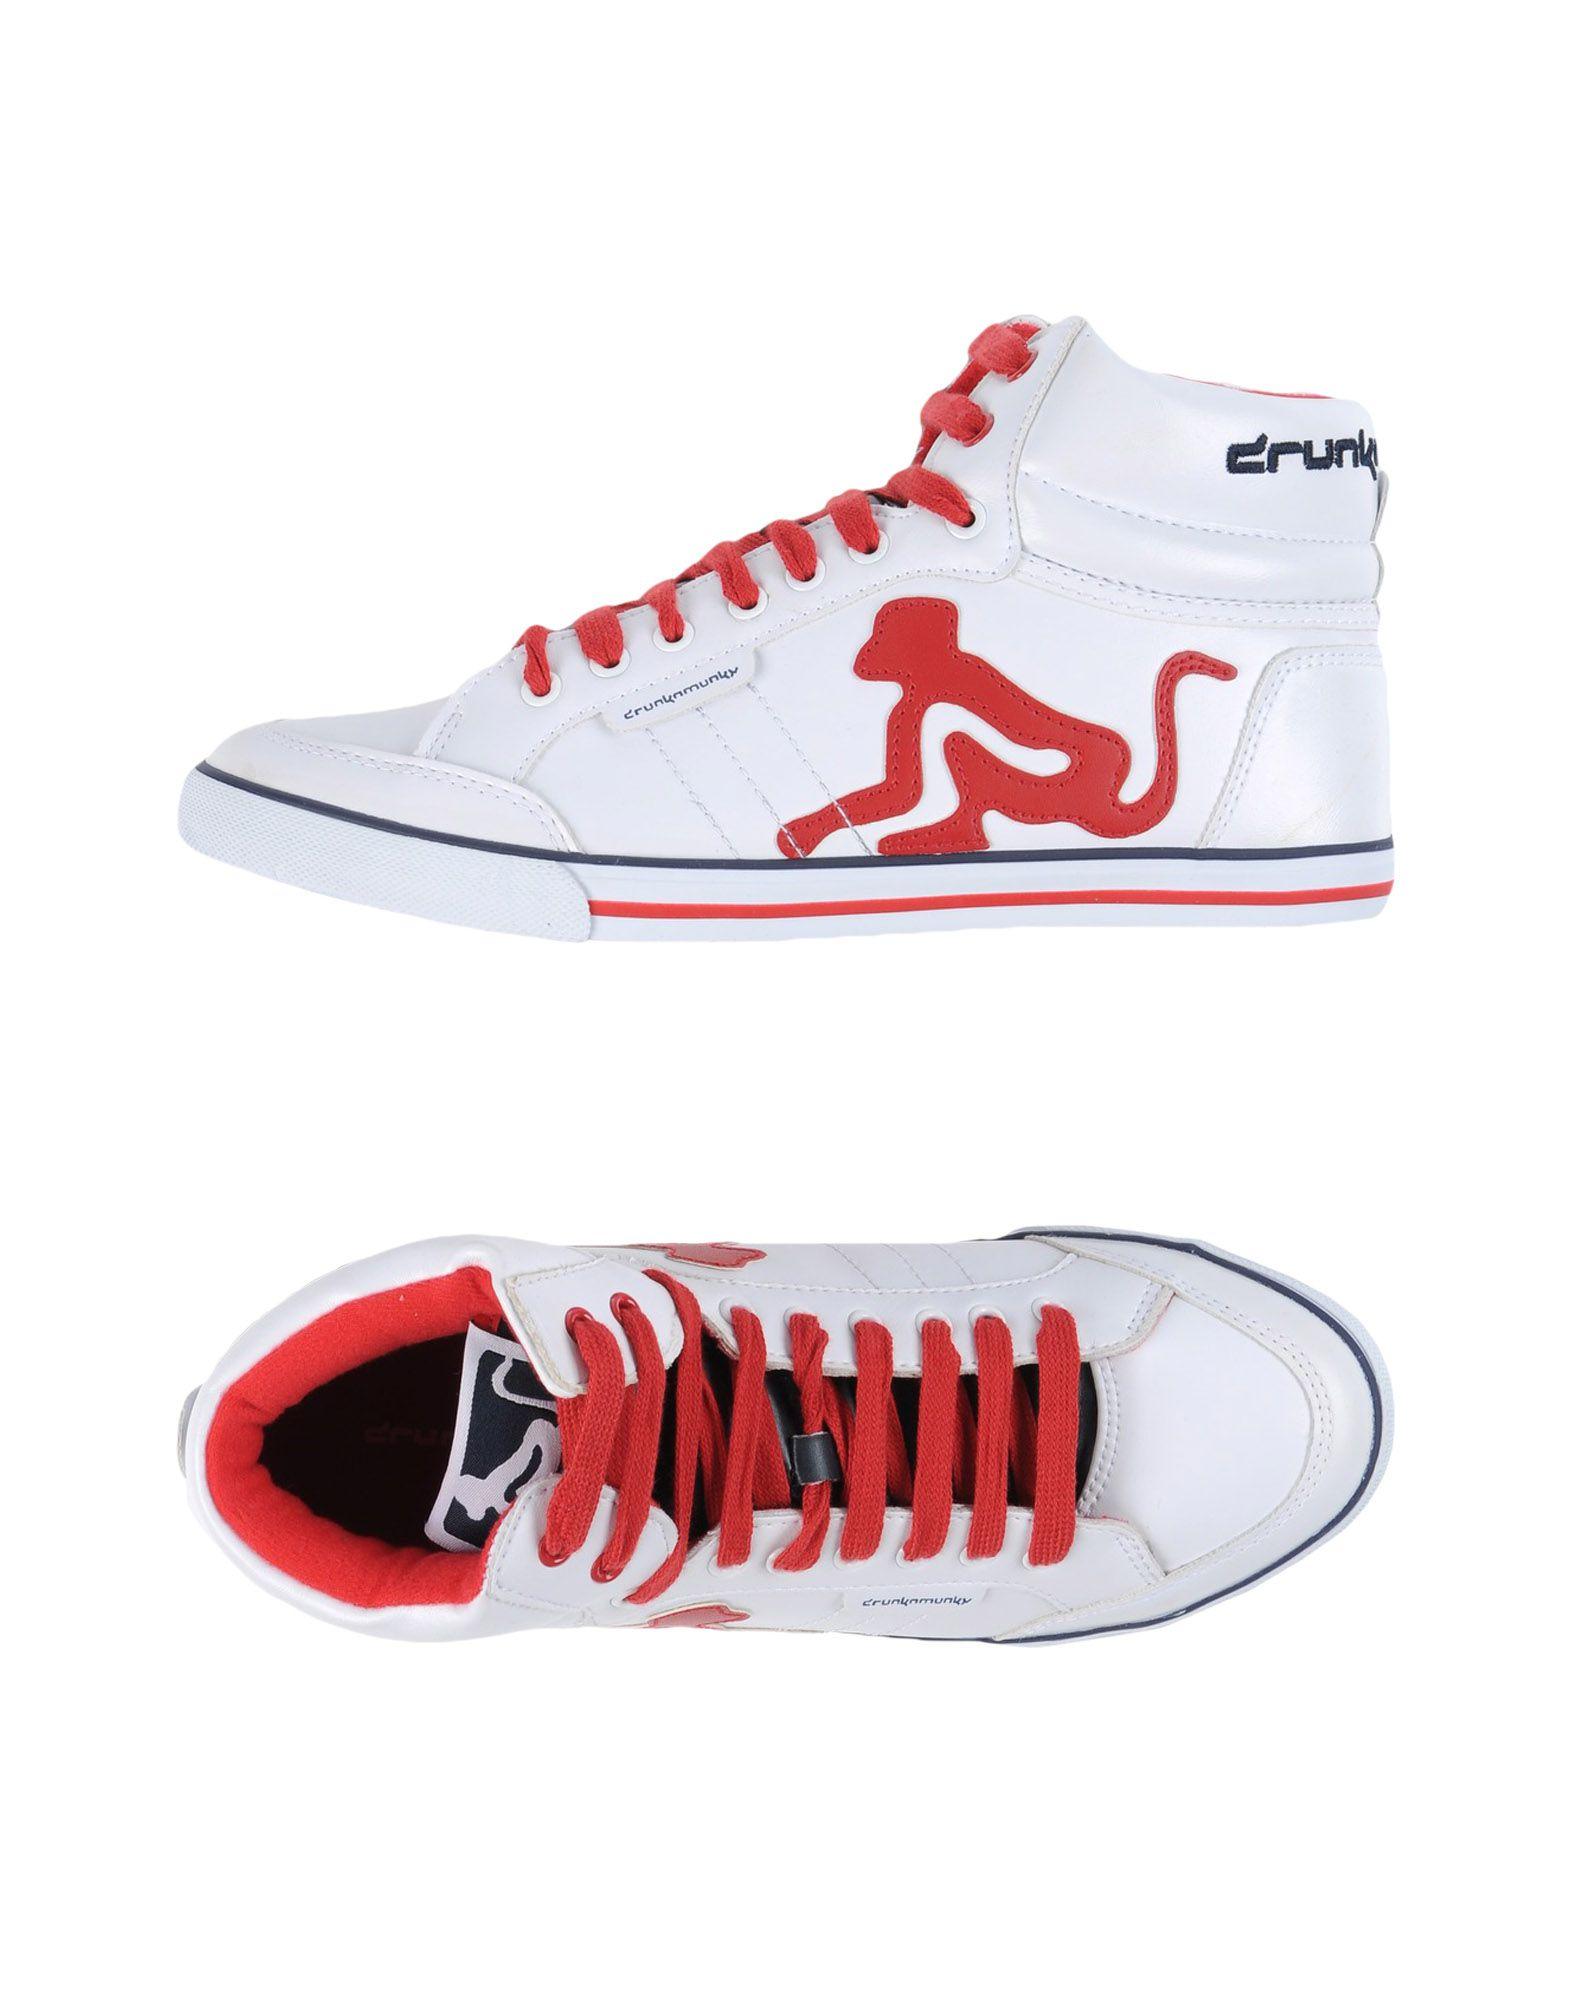 Moda Sneakers - Drunknmunky Uomo - Sneakers 11344608EM 784cc5